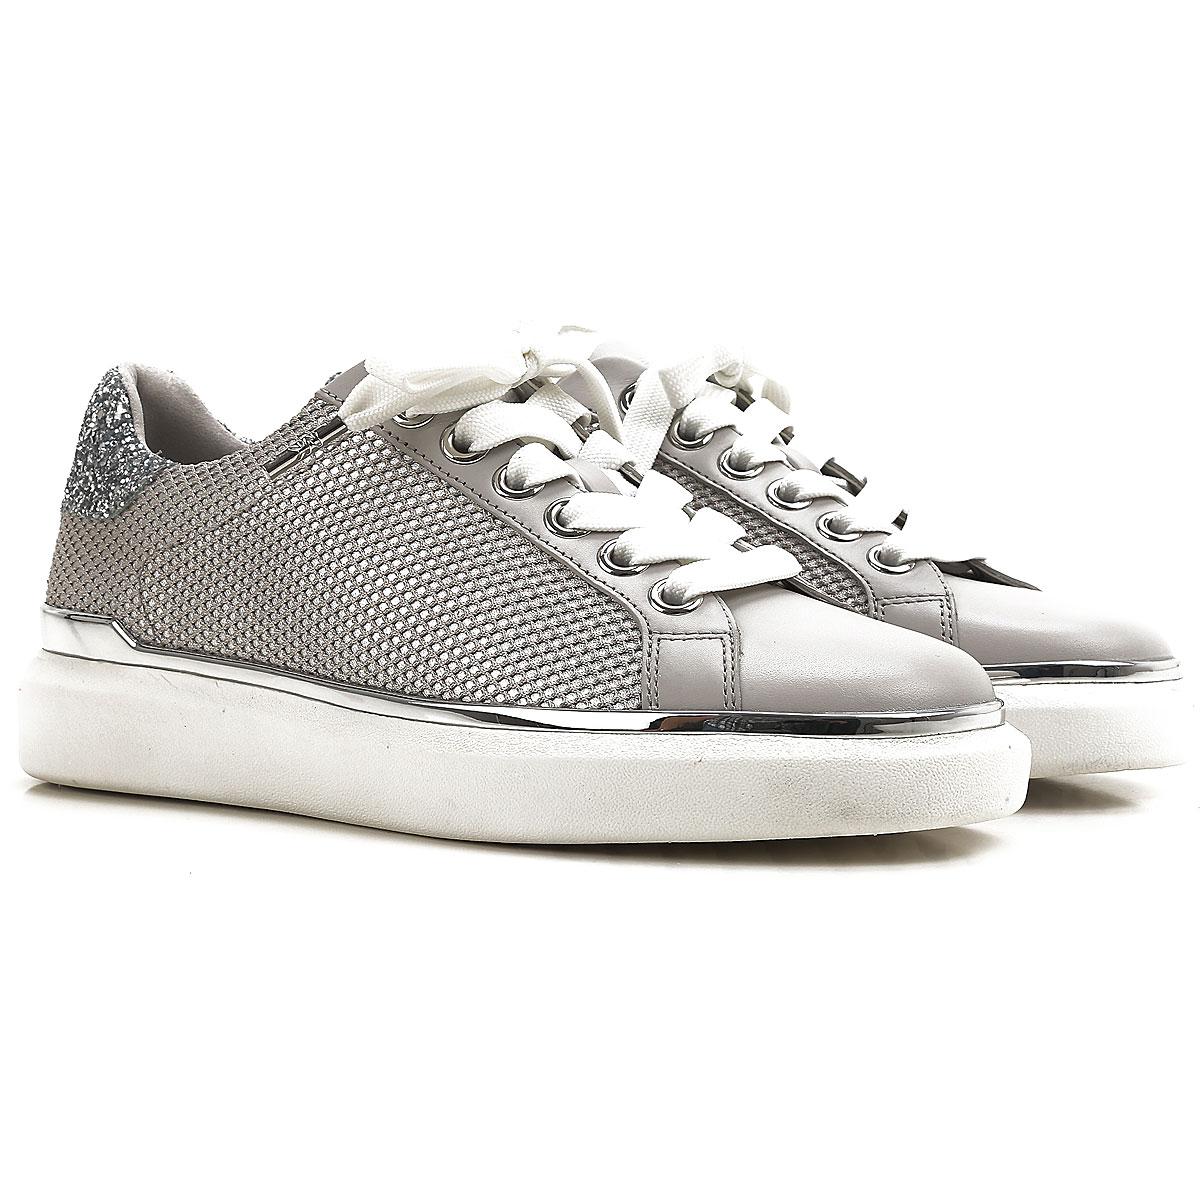 Michael Kors Sneakers for Women On Sale, Aluminum, Mesh, 2017, US 9 EU 40 US 8.5  EU 39